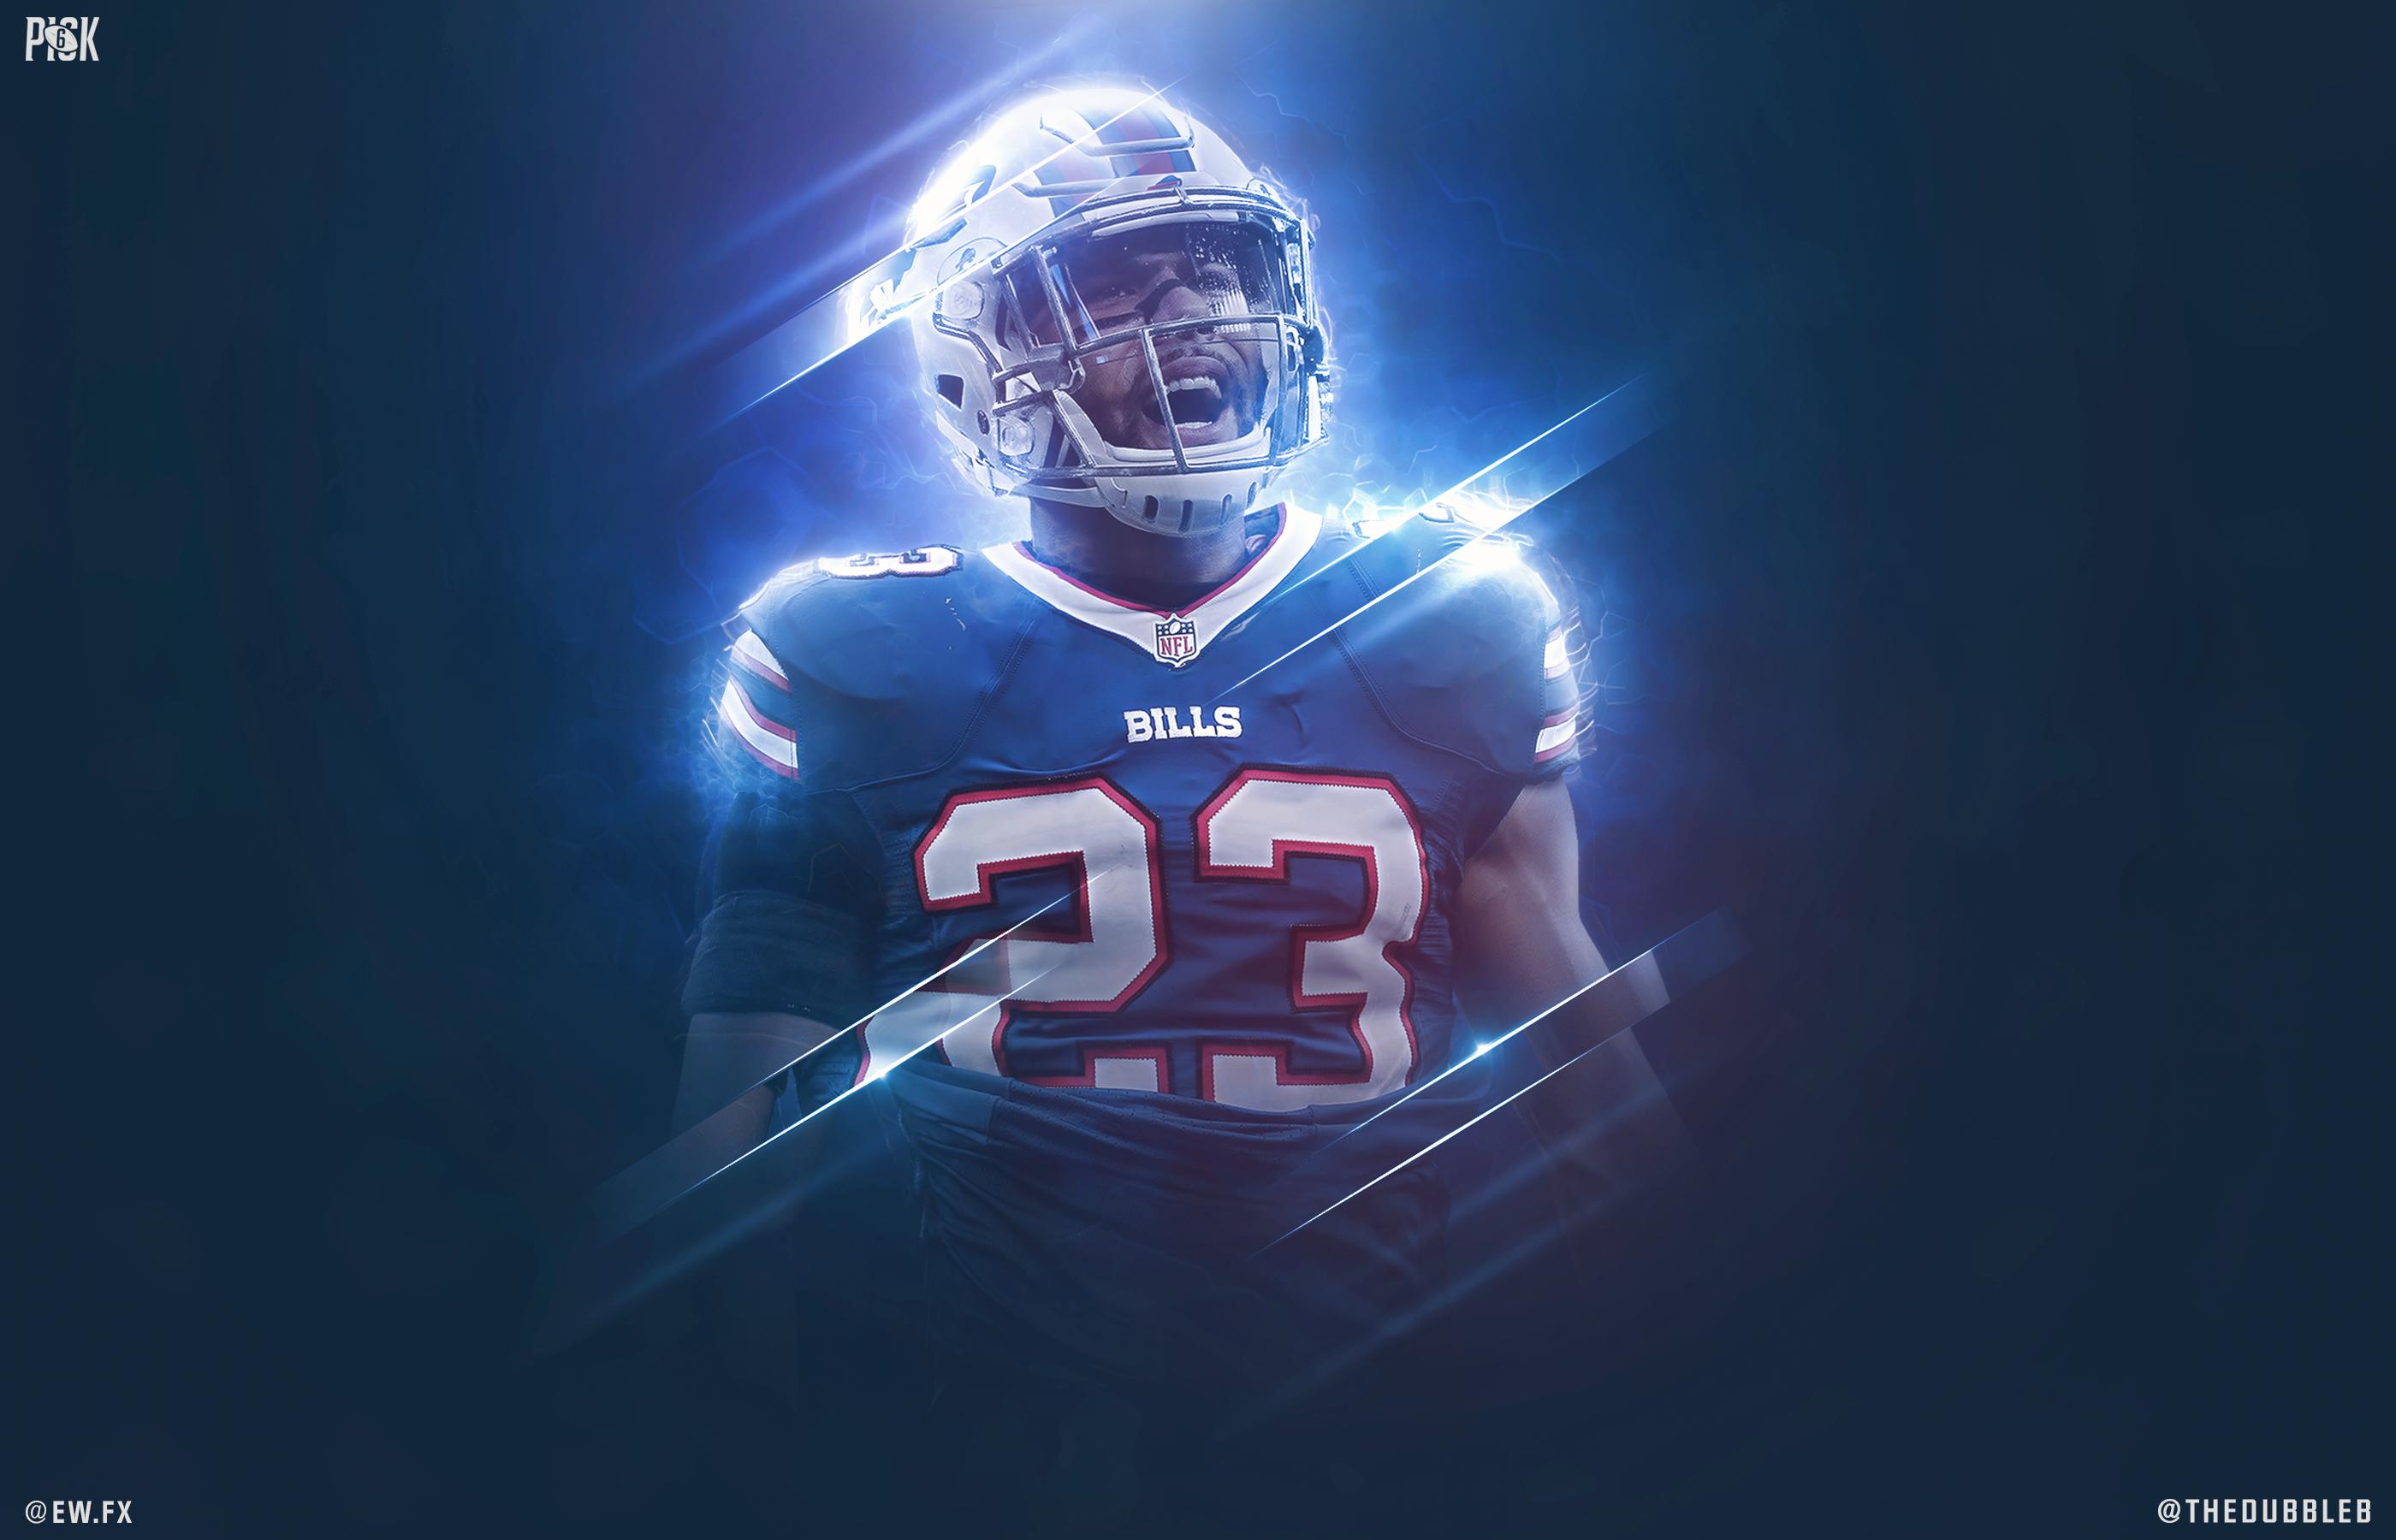 278d66e27094a5 NFL Wallpapers [2017] - Personal Project   sports gfx   Wallpaper ...